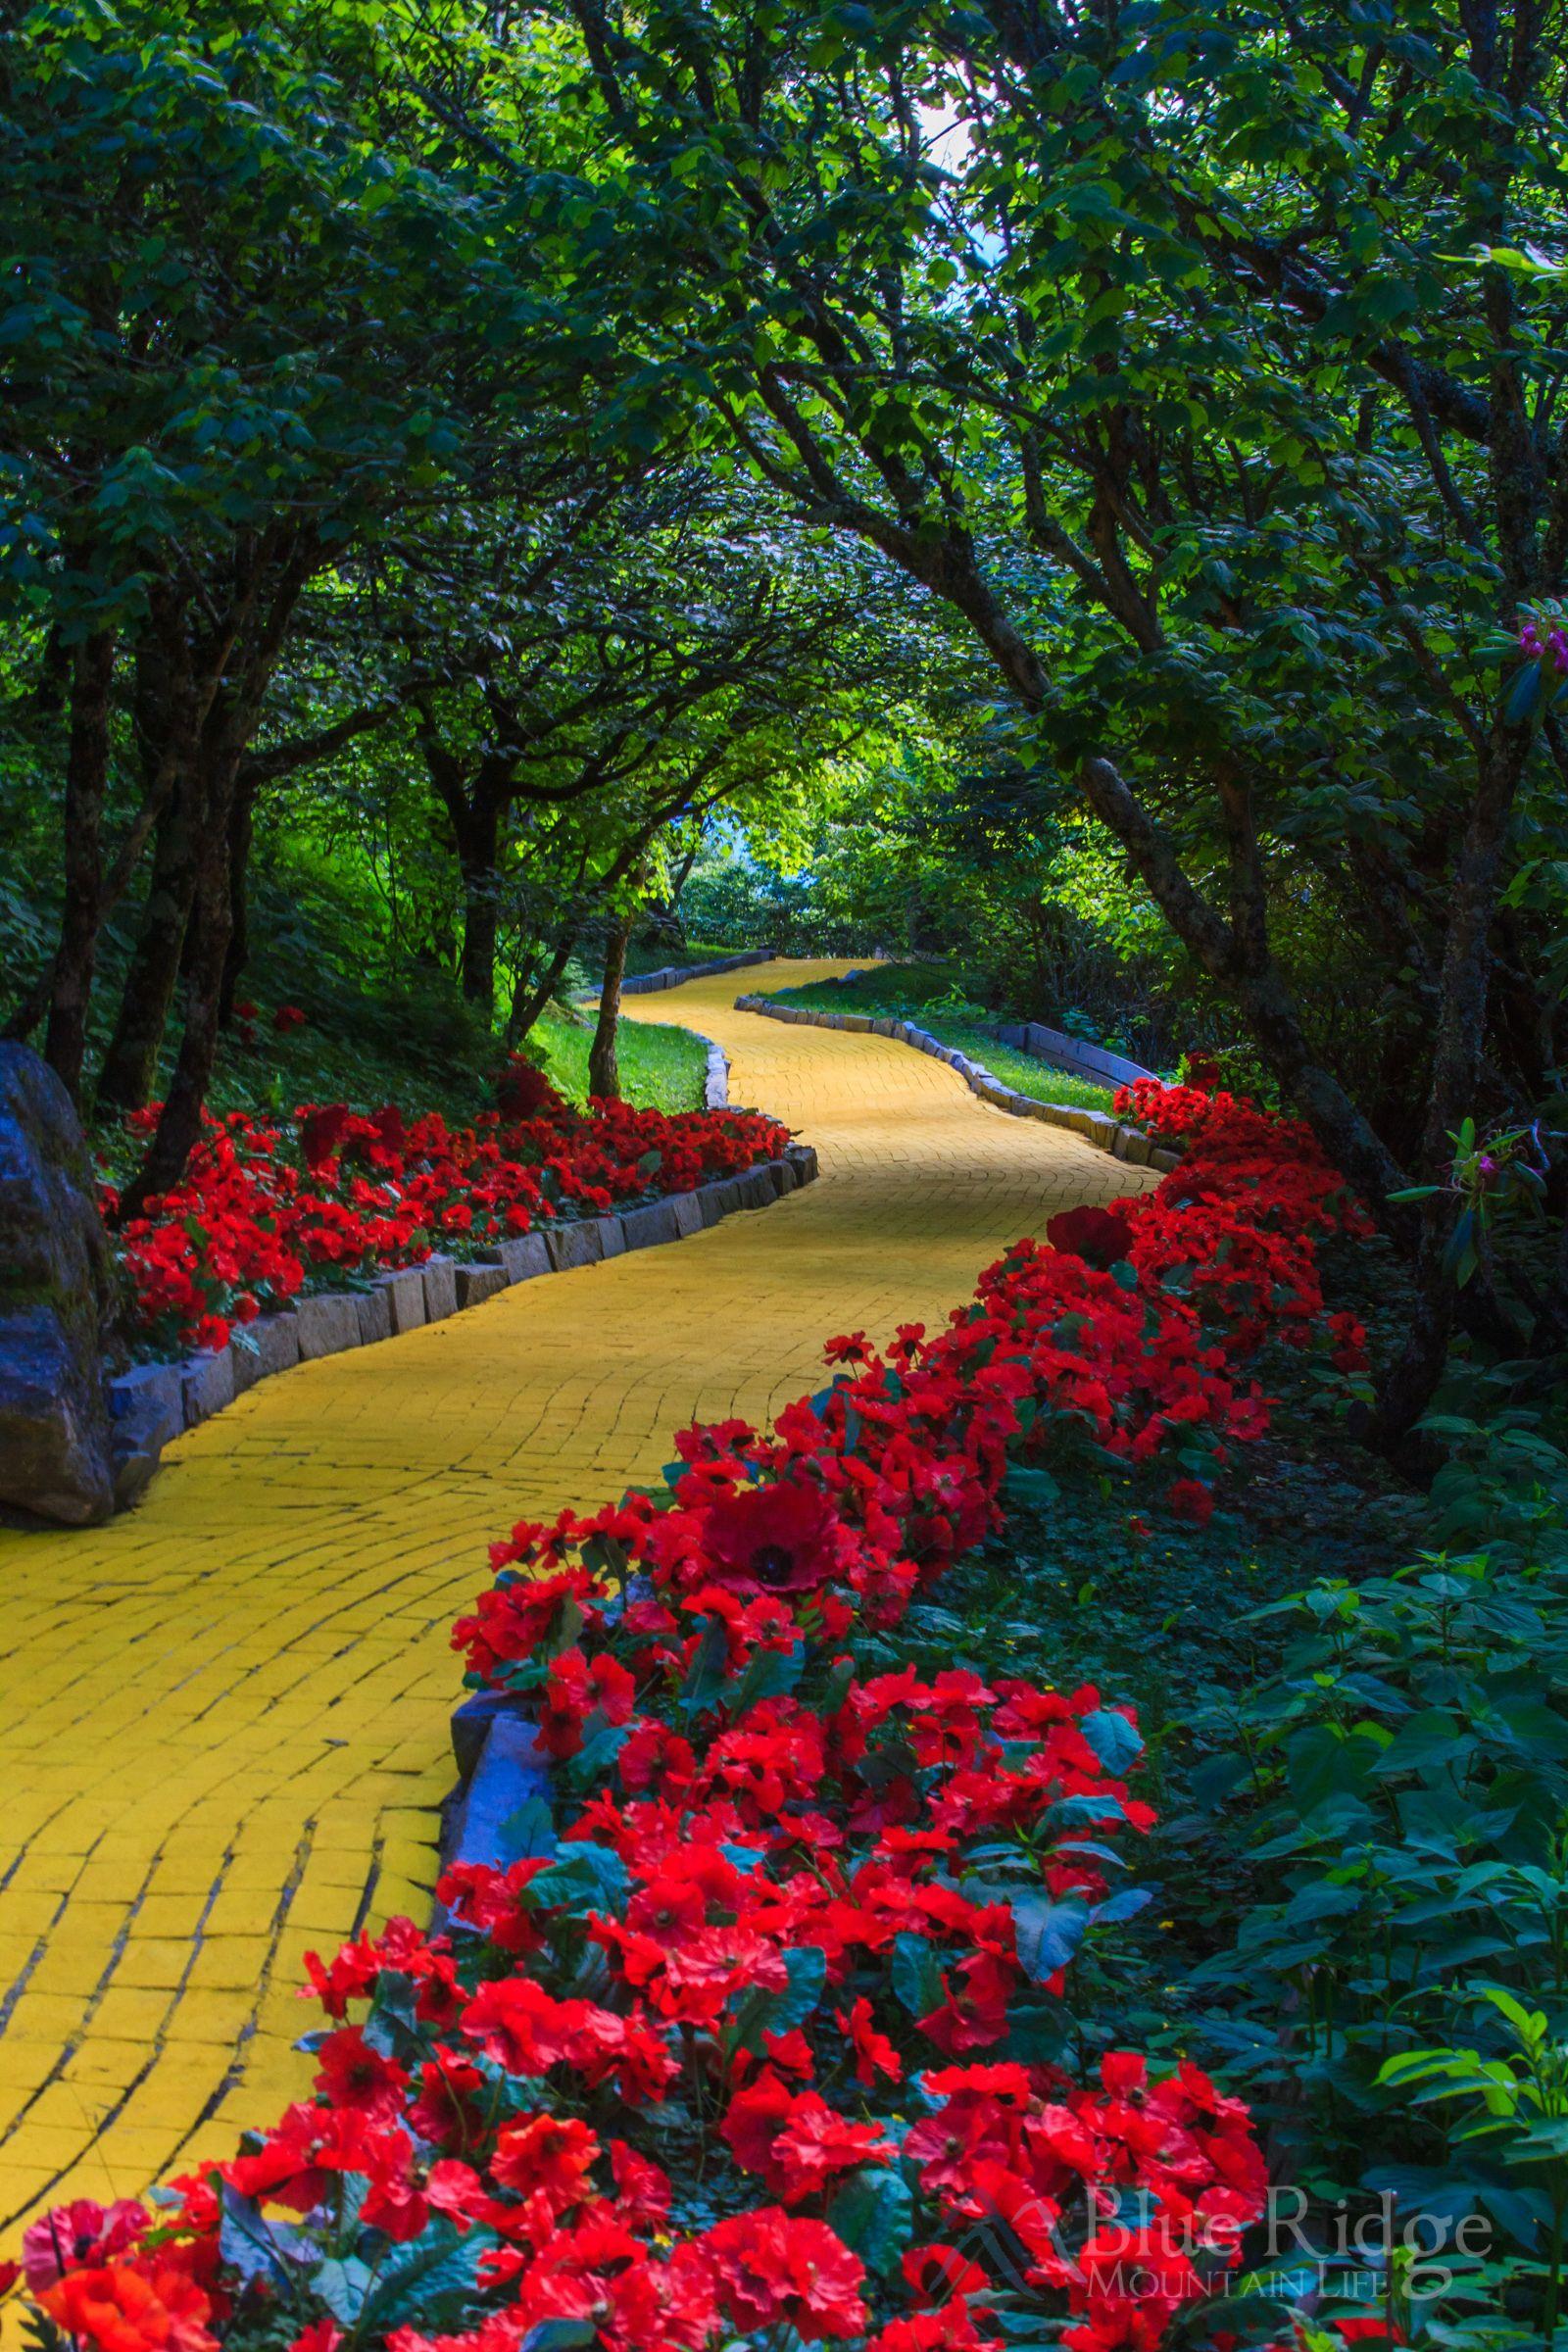 Land Of Oz Theme Park Beech Mountain Nc In